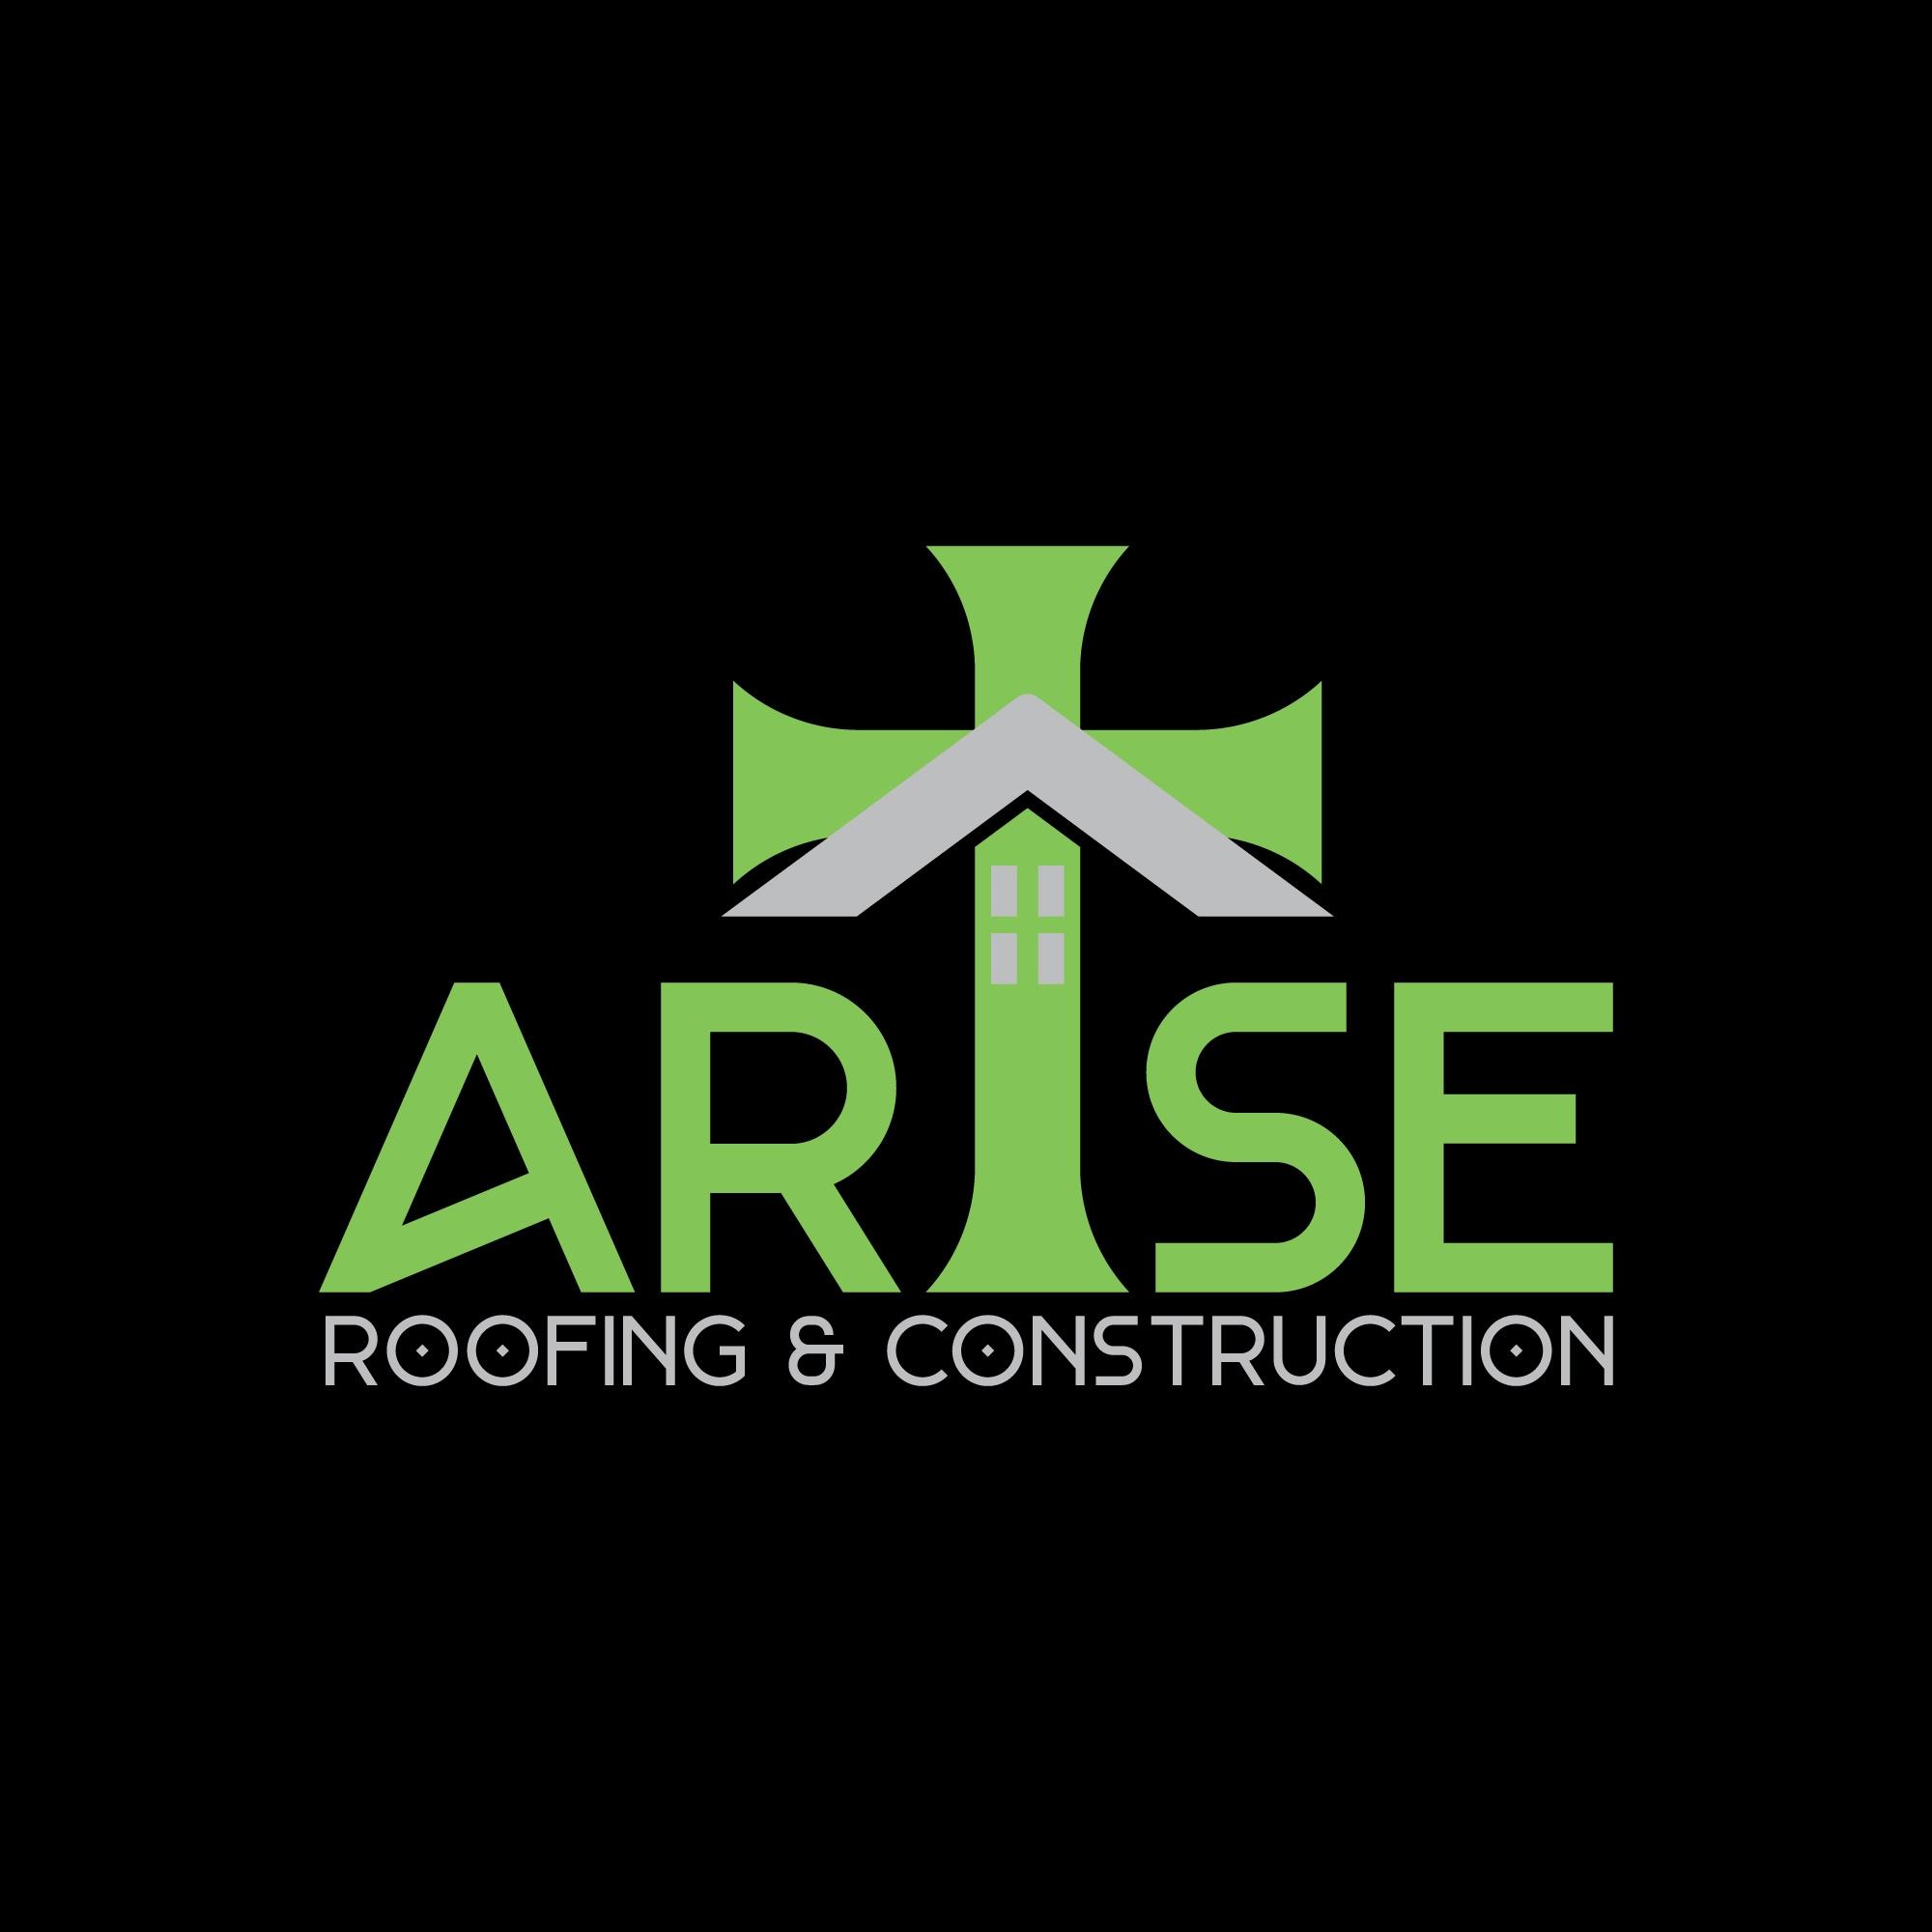 Arise Roofing & Construction, LLC